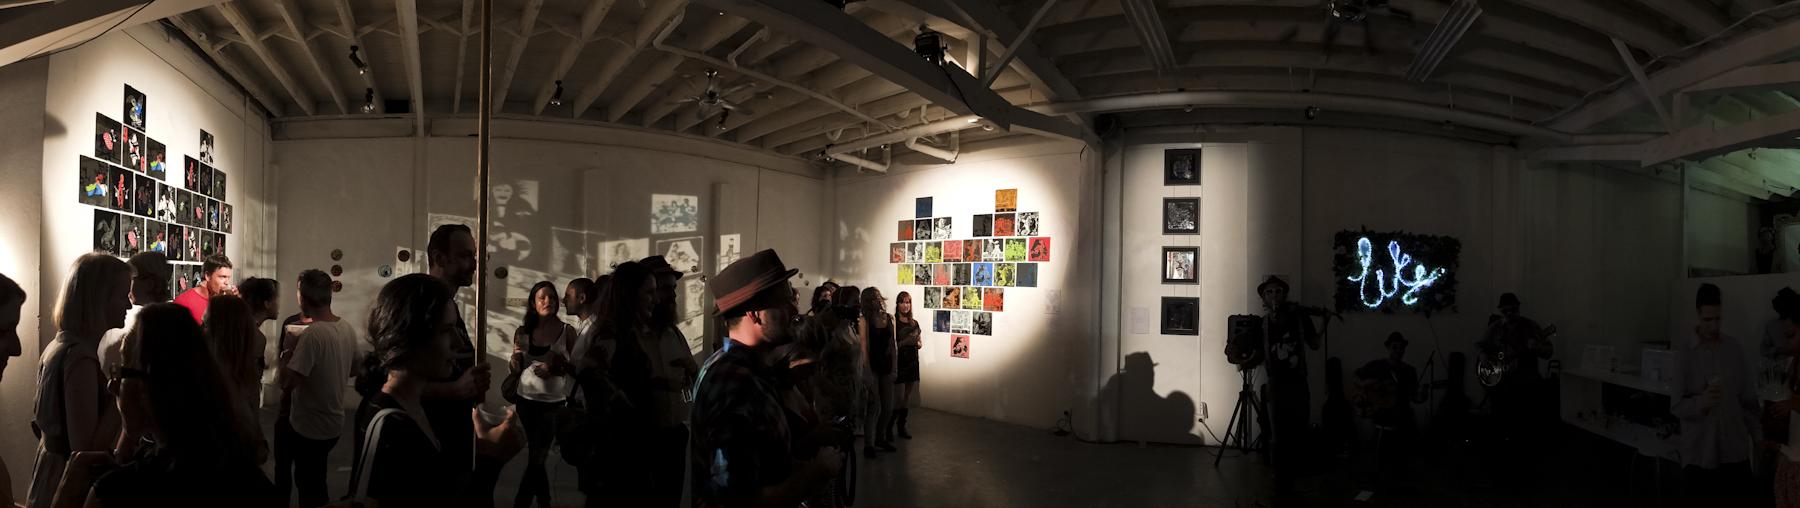 aMBUSH Gallery_Inside